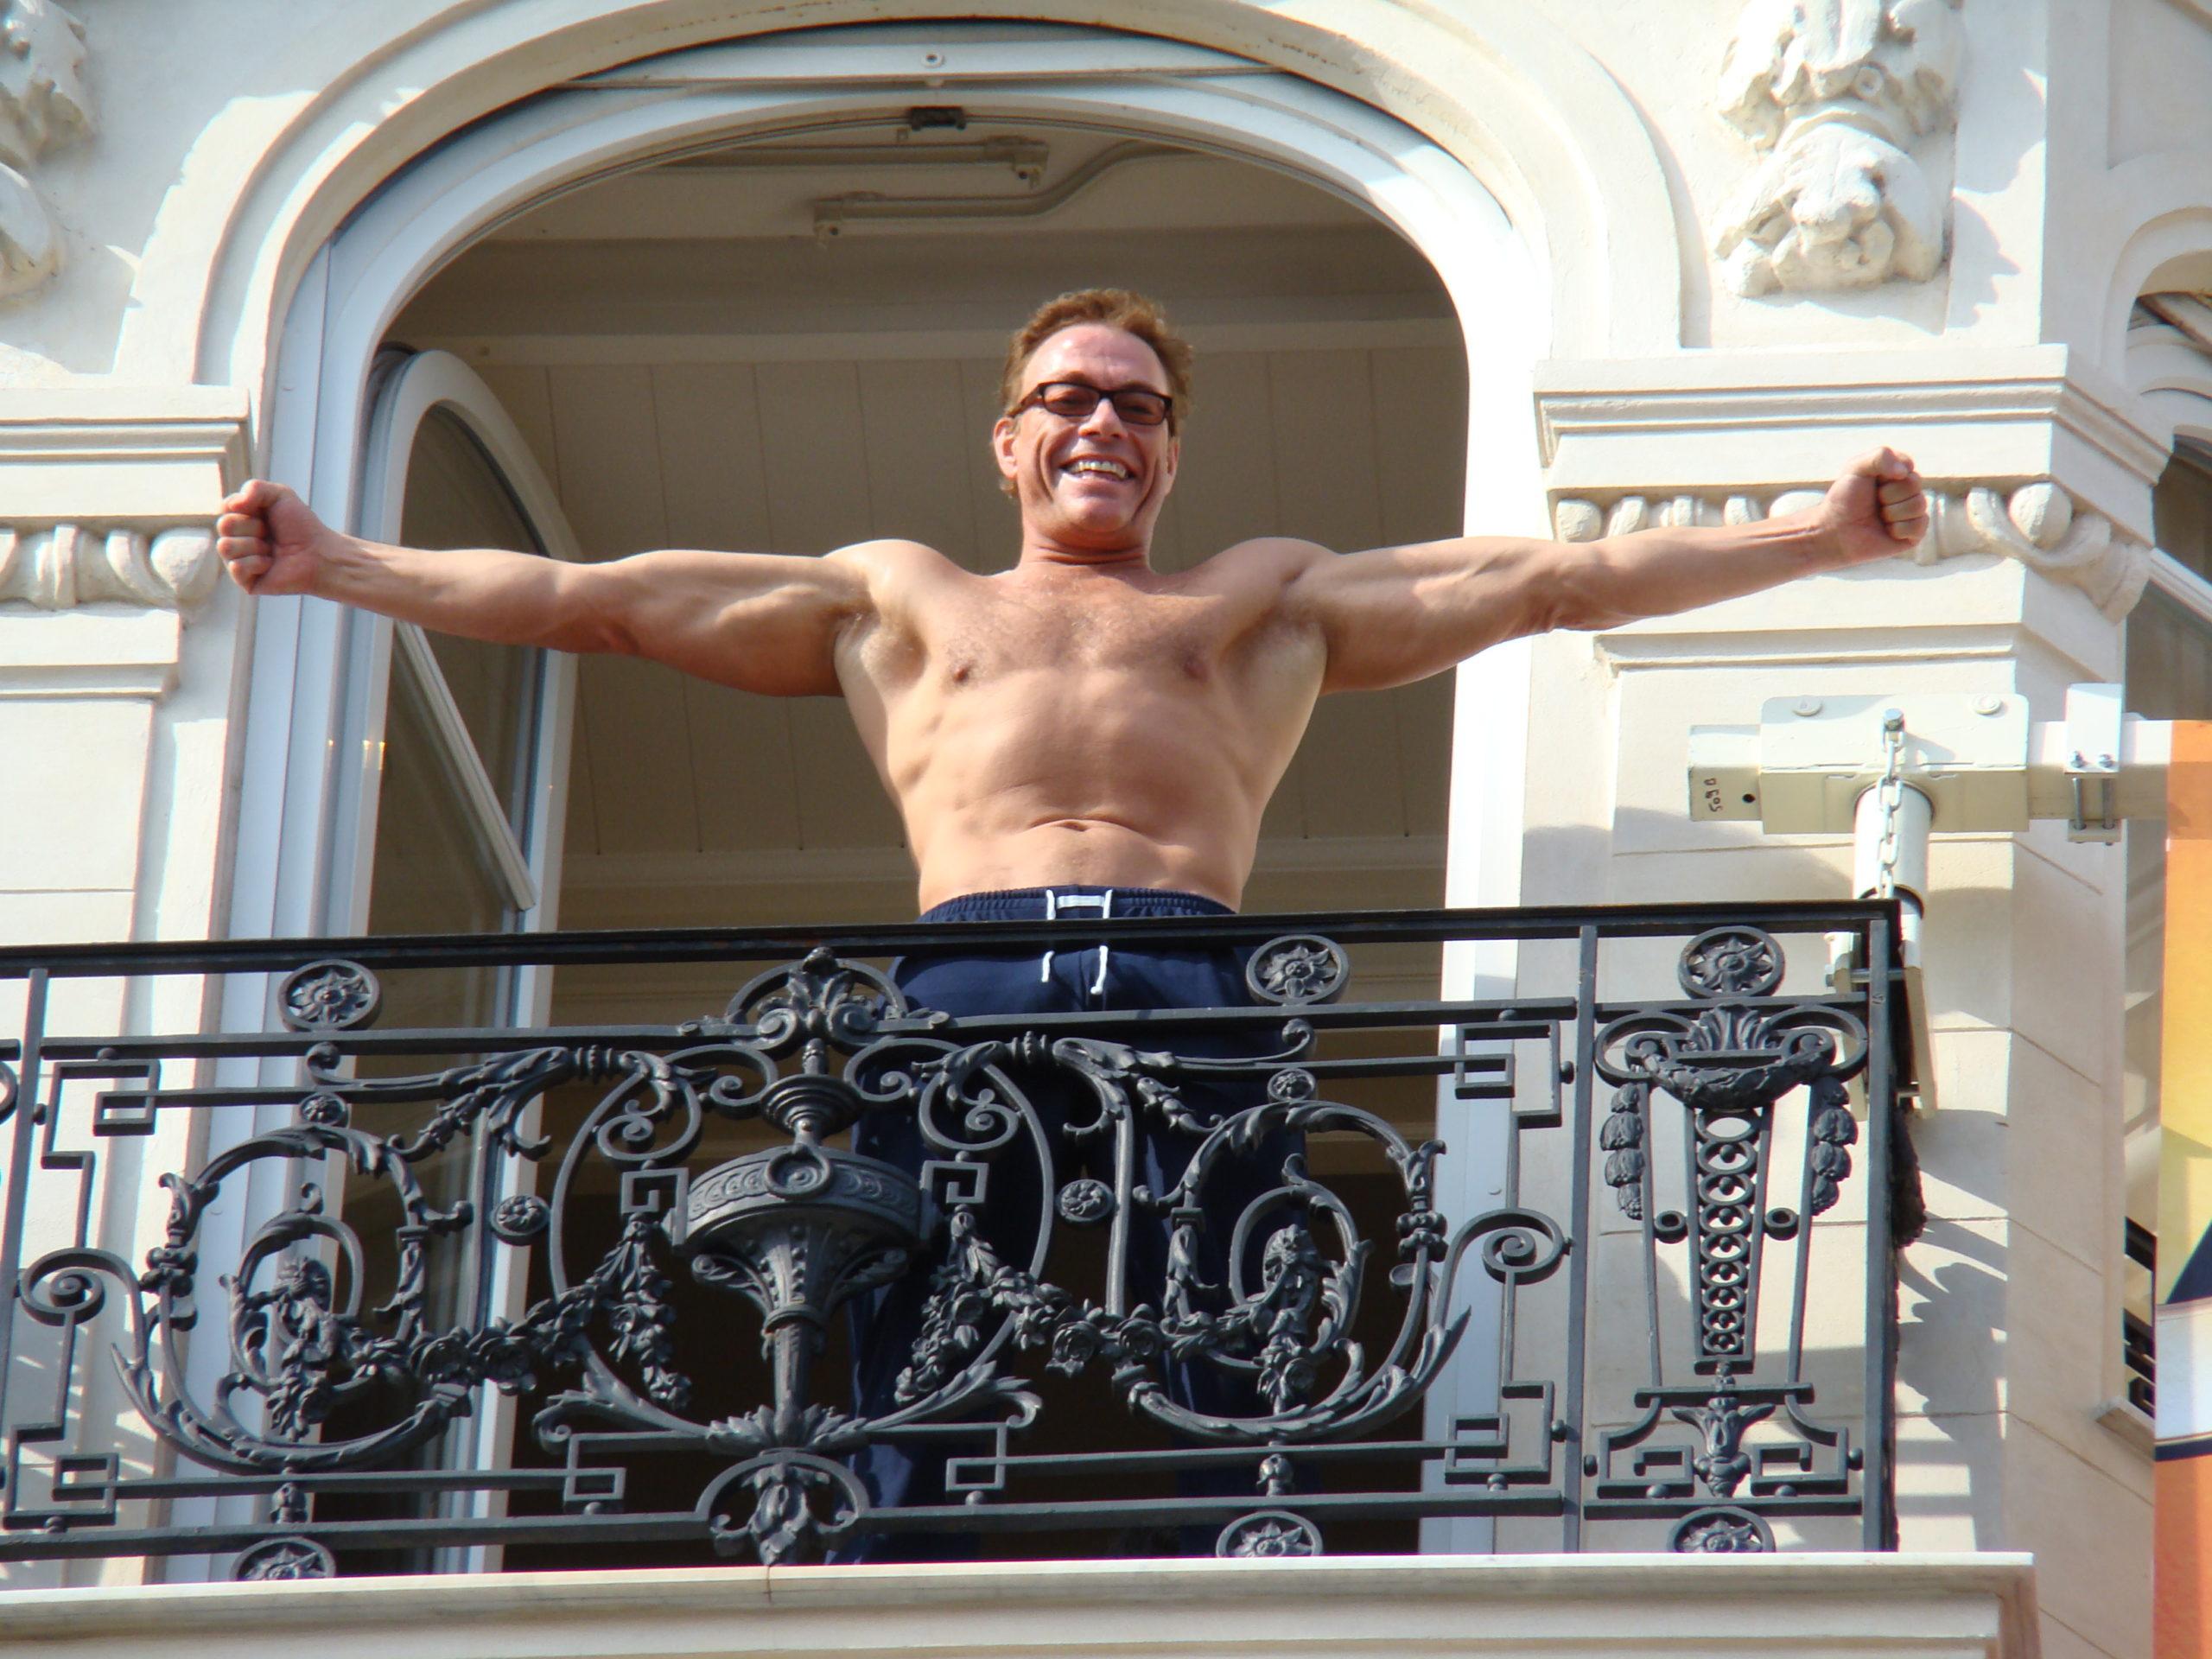 Van Damme showing his upper body muscles